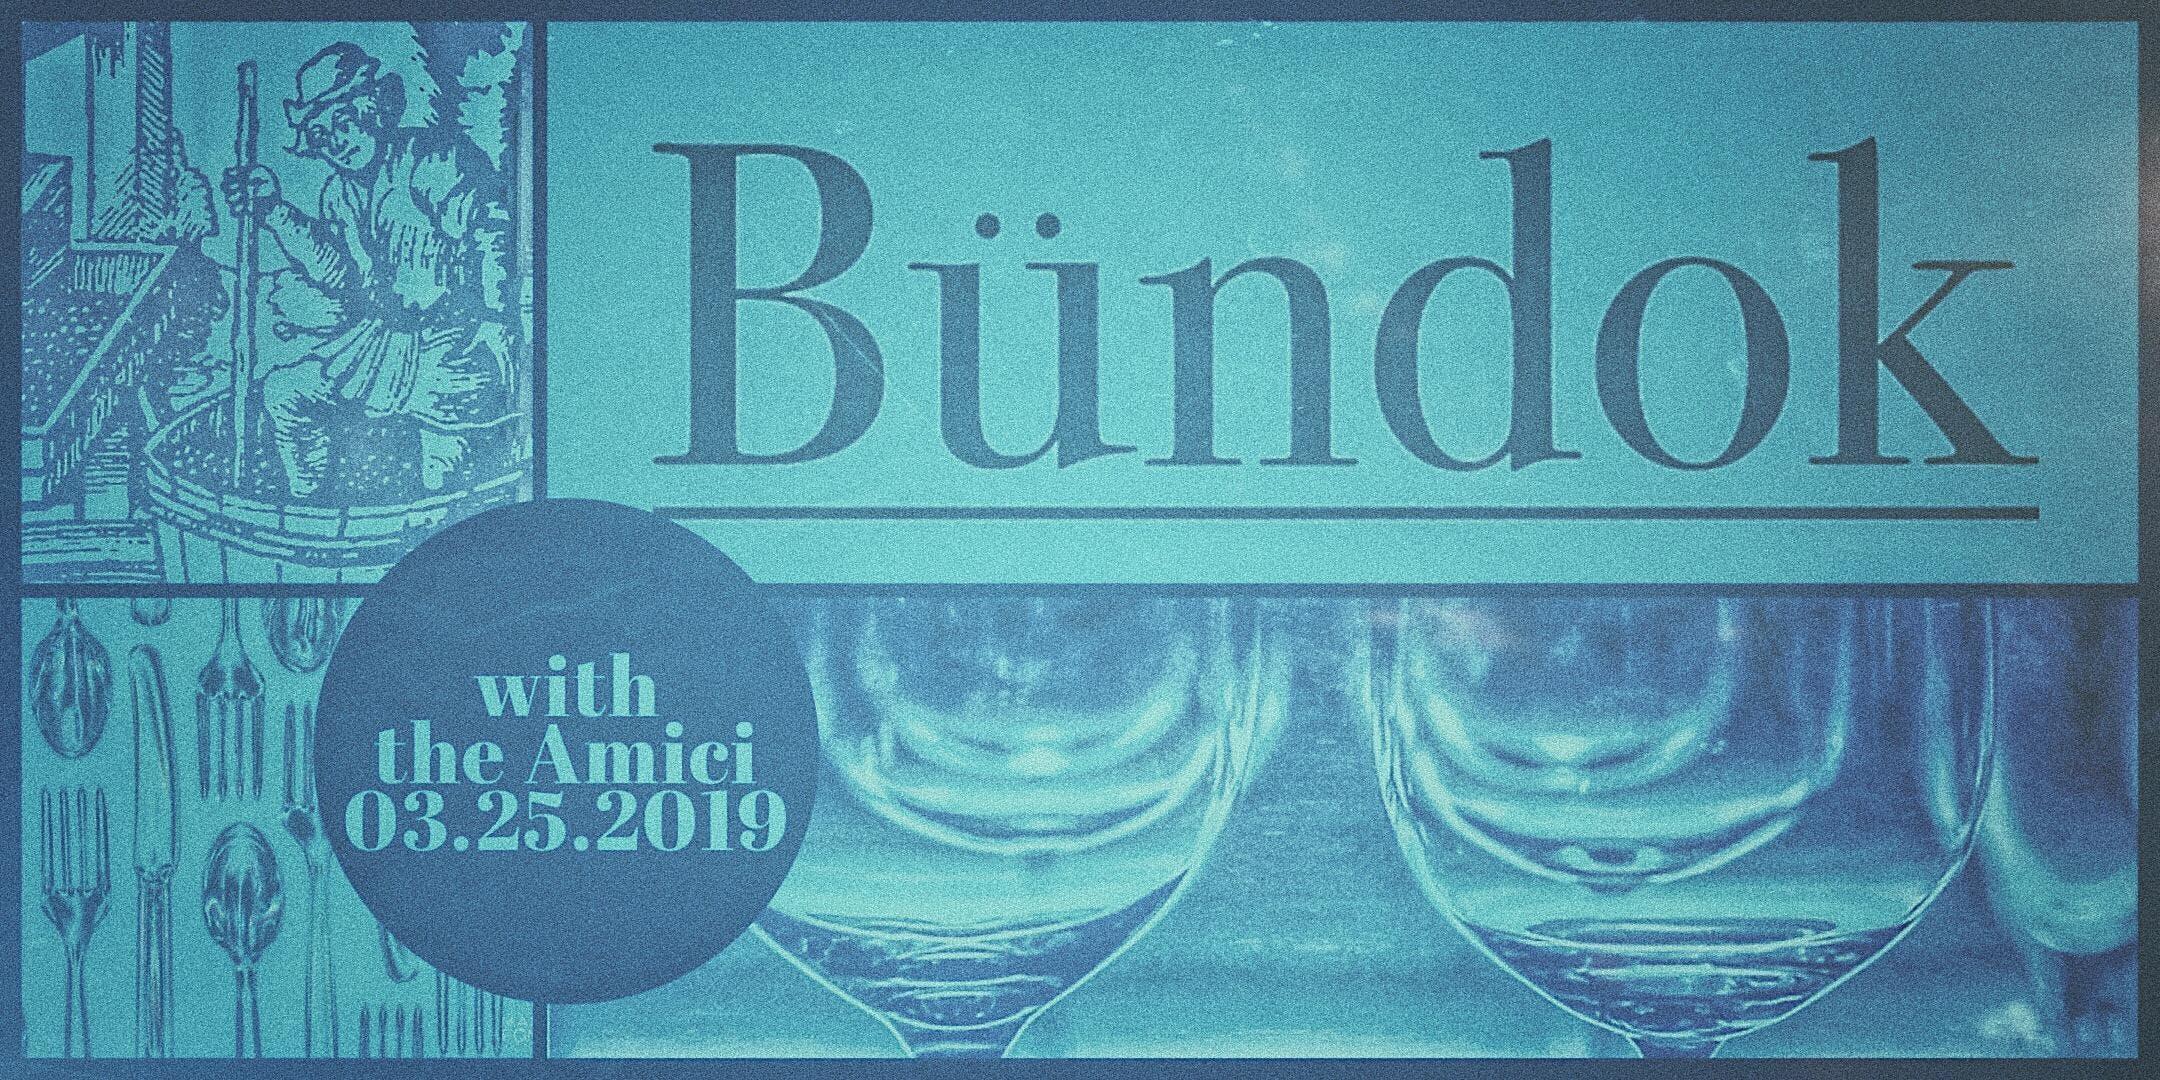 The Amici Burst into Bündok